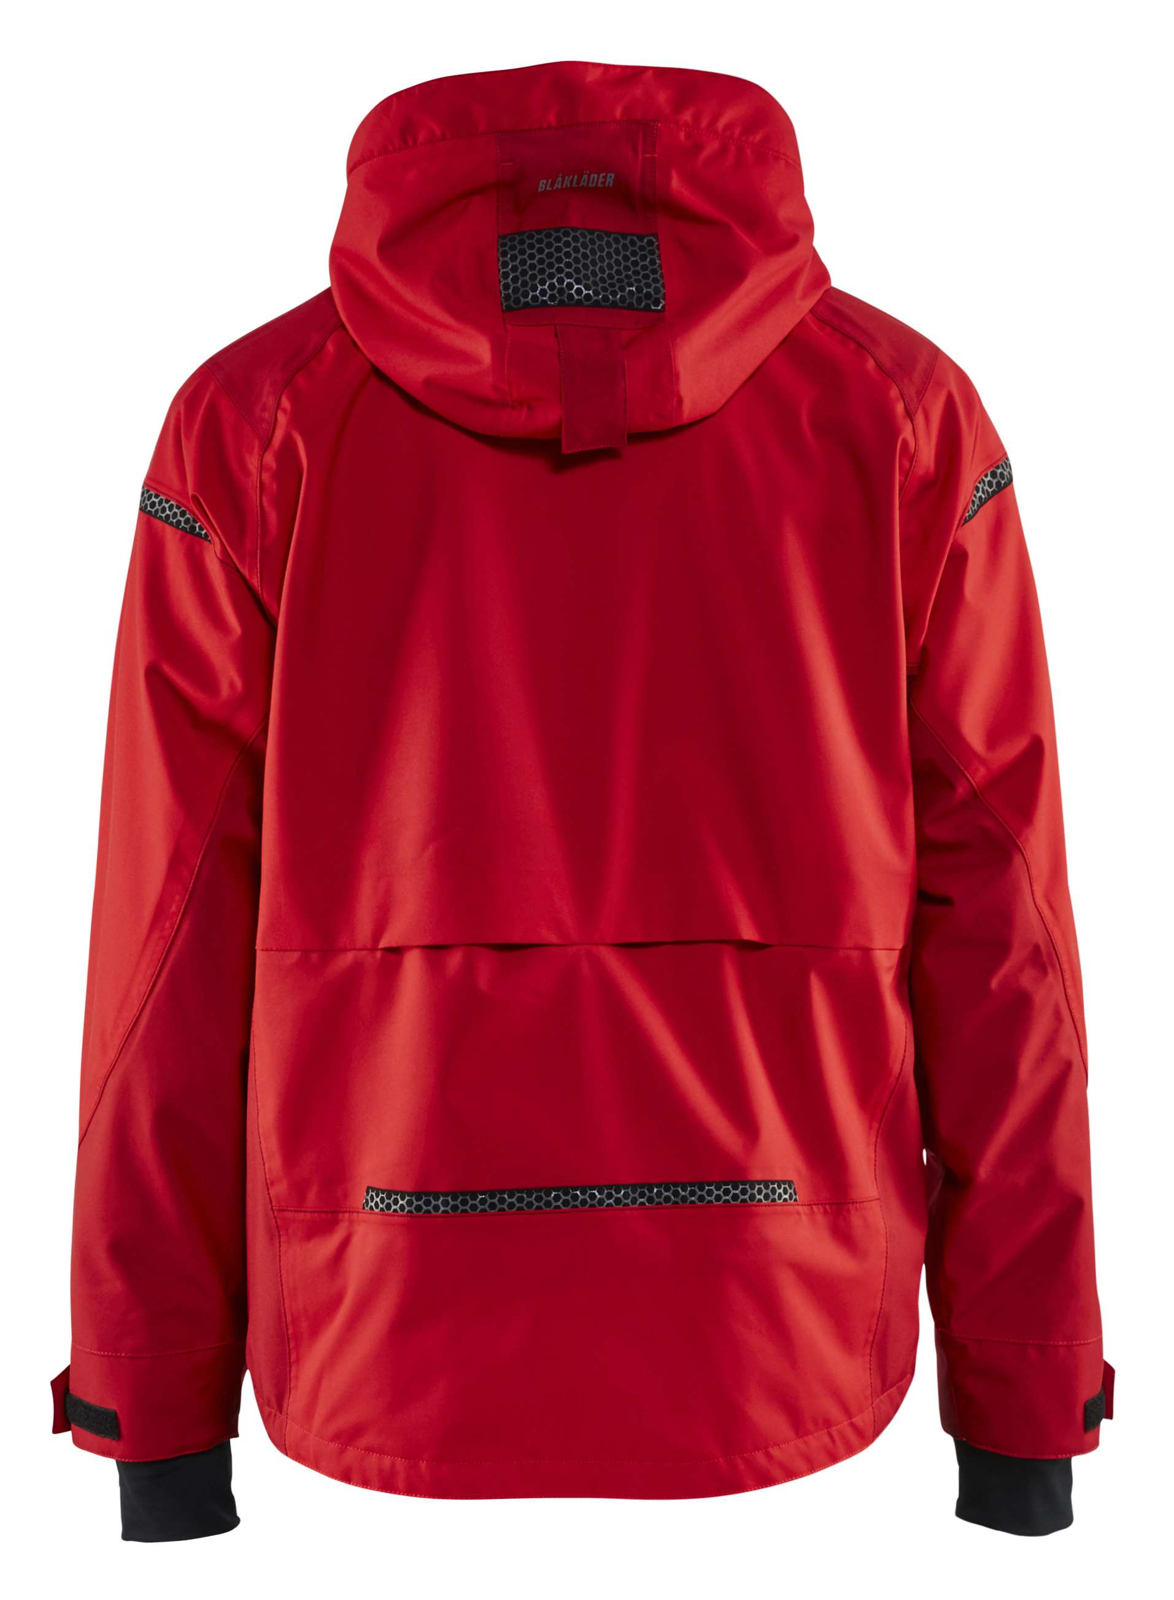 Blaklader Regenjacks 49881987 Stretch rood-donkerrood(5658)